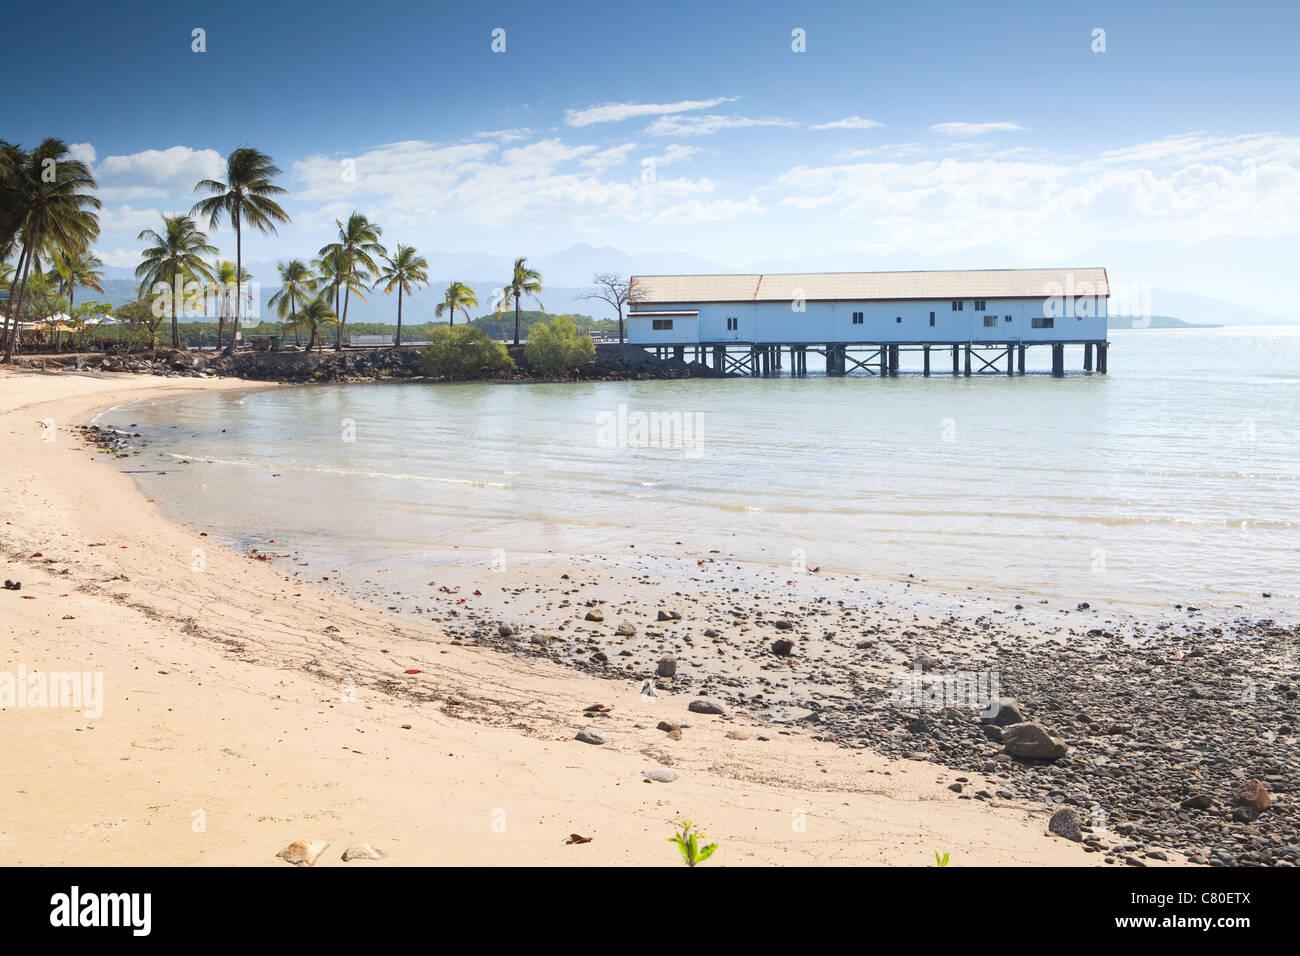 port douglas tropical queensland australia boat house with palm trees sand on beach pole house - Stock Image